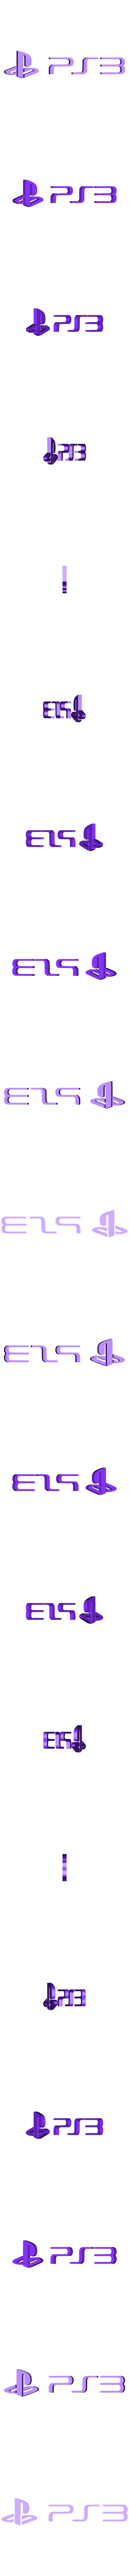 PS3_letters.stl Download free STL file Playstation 4/3 Game Case Holder- Flat & Full Back Options • 3D printing template, mark579